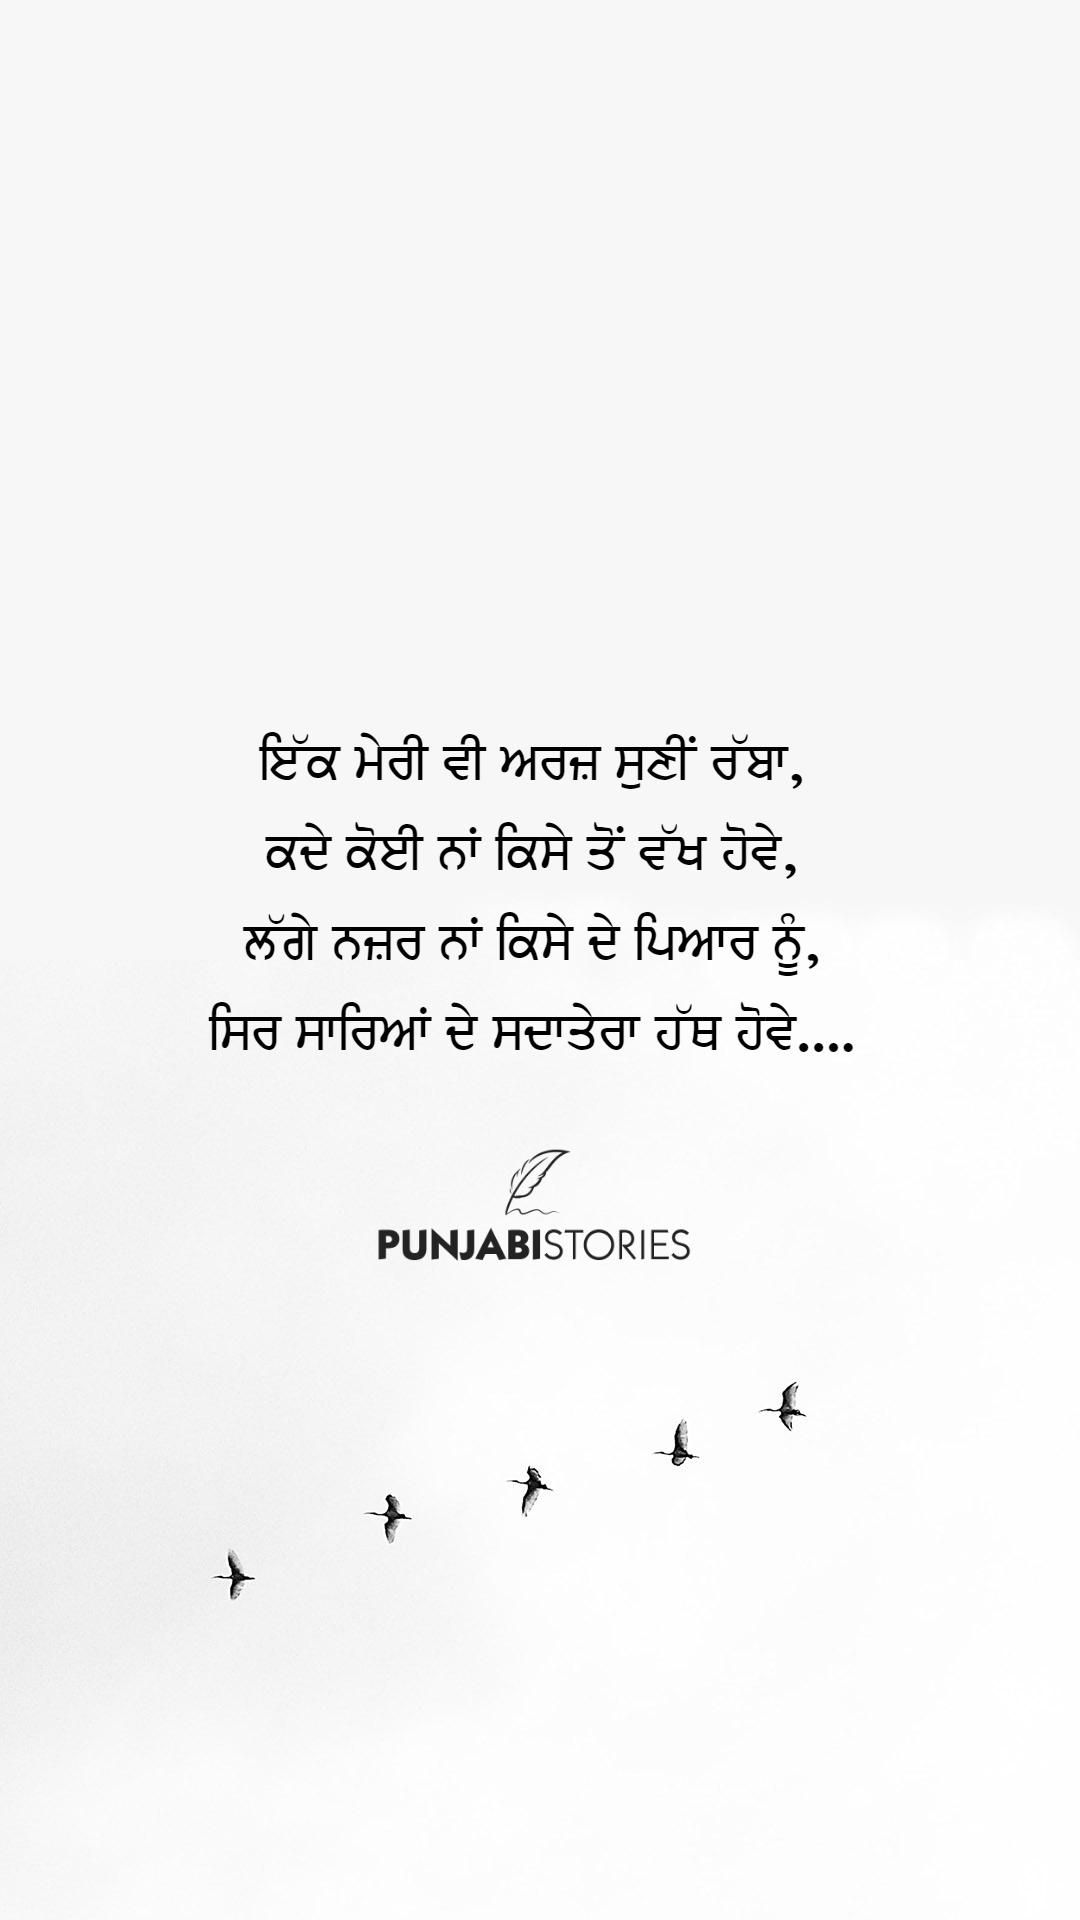 dharmik status punjabi, Dharmik Status in Punjabi